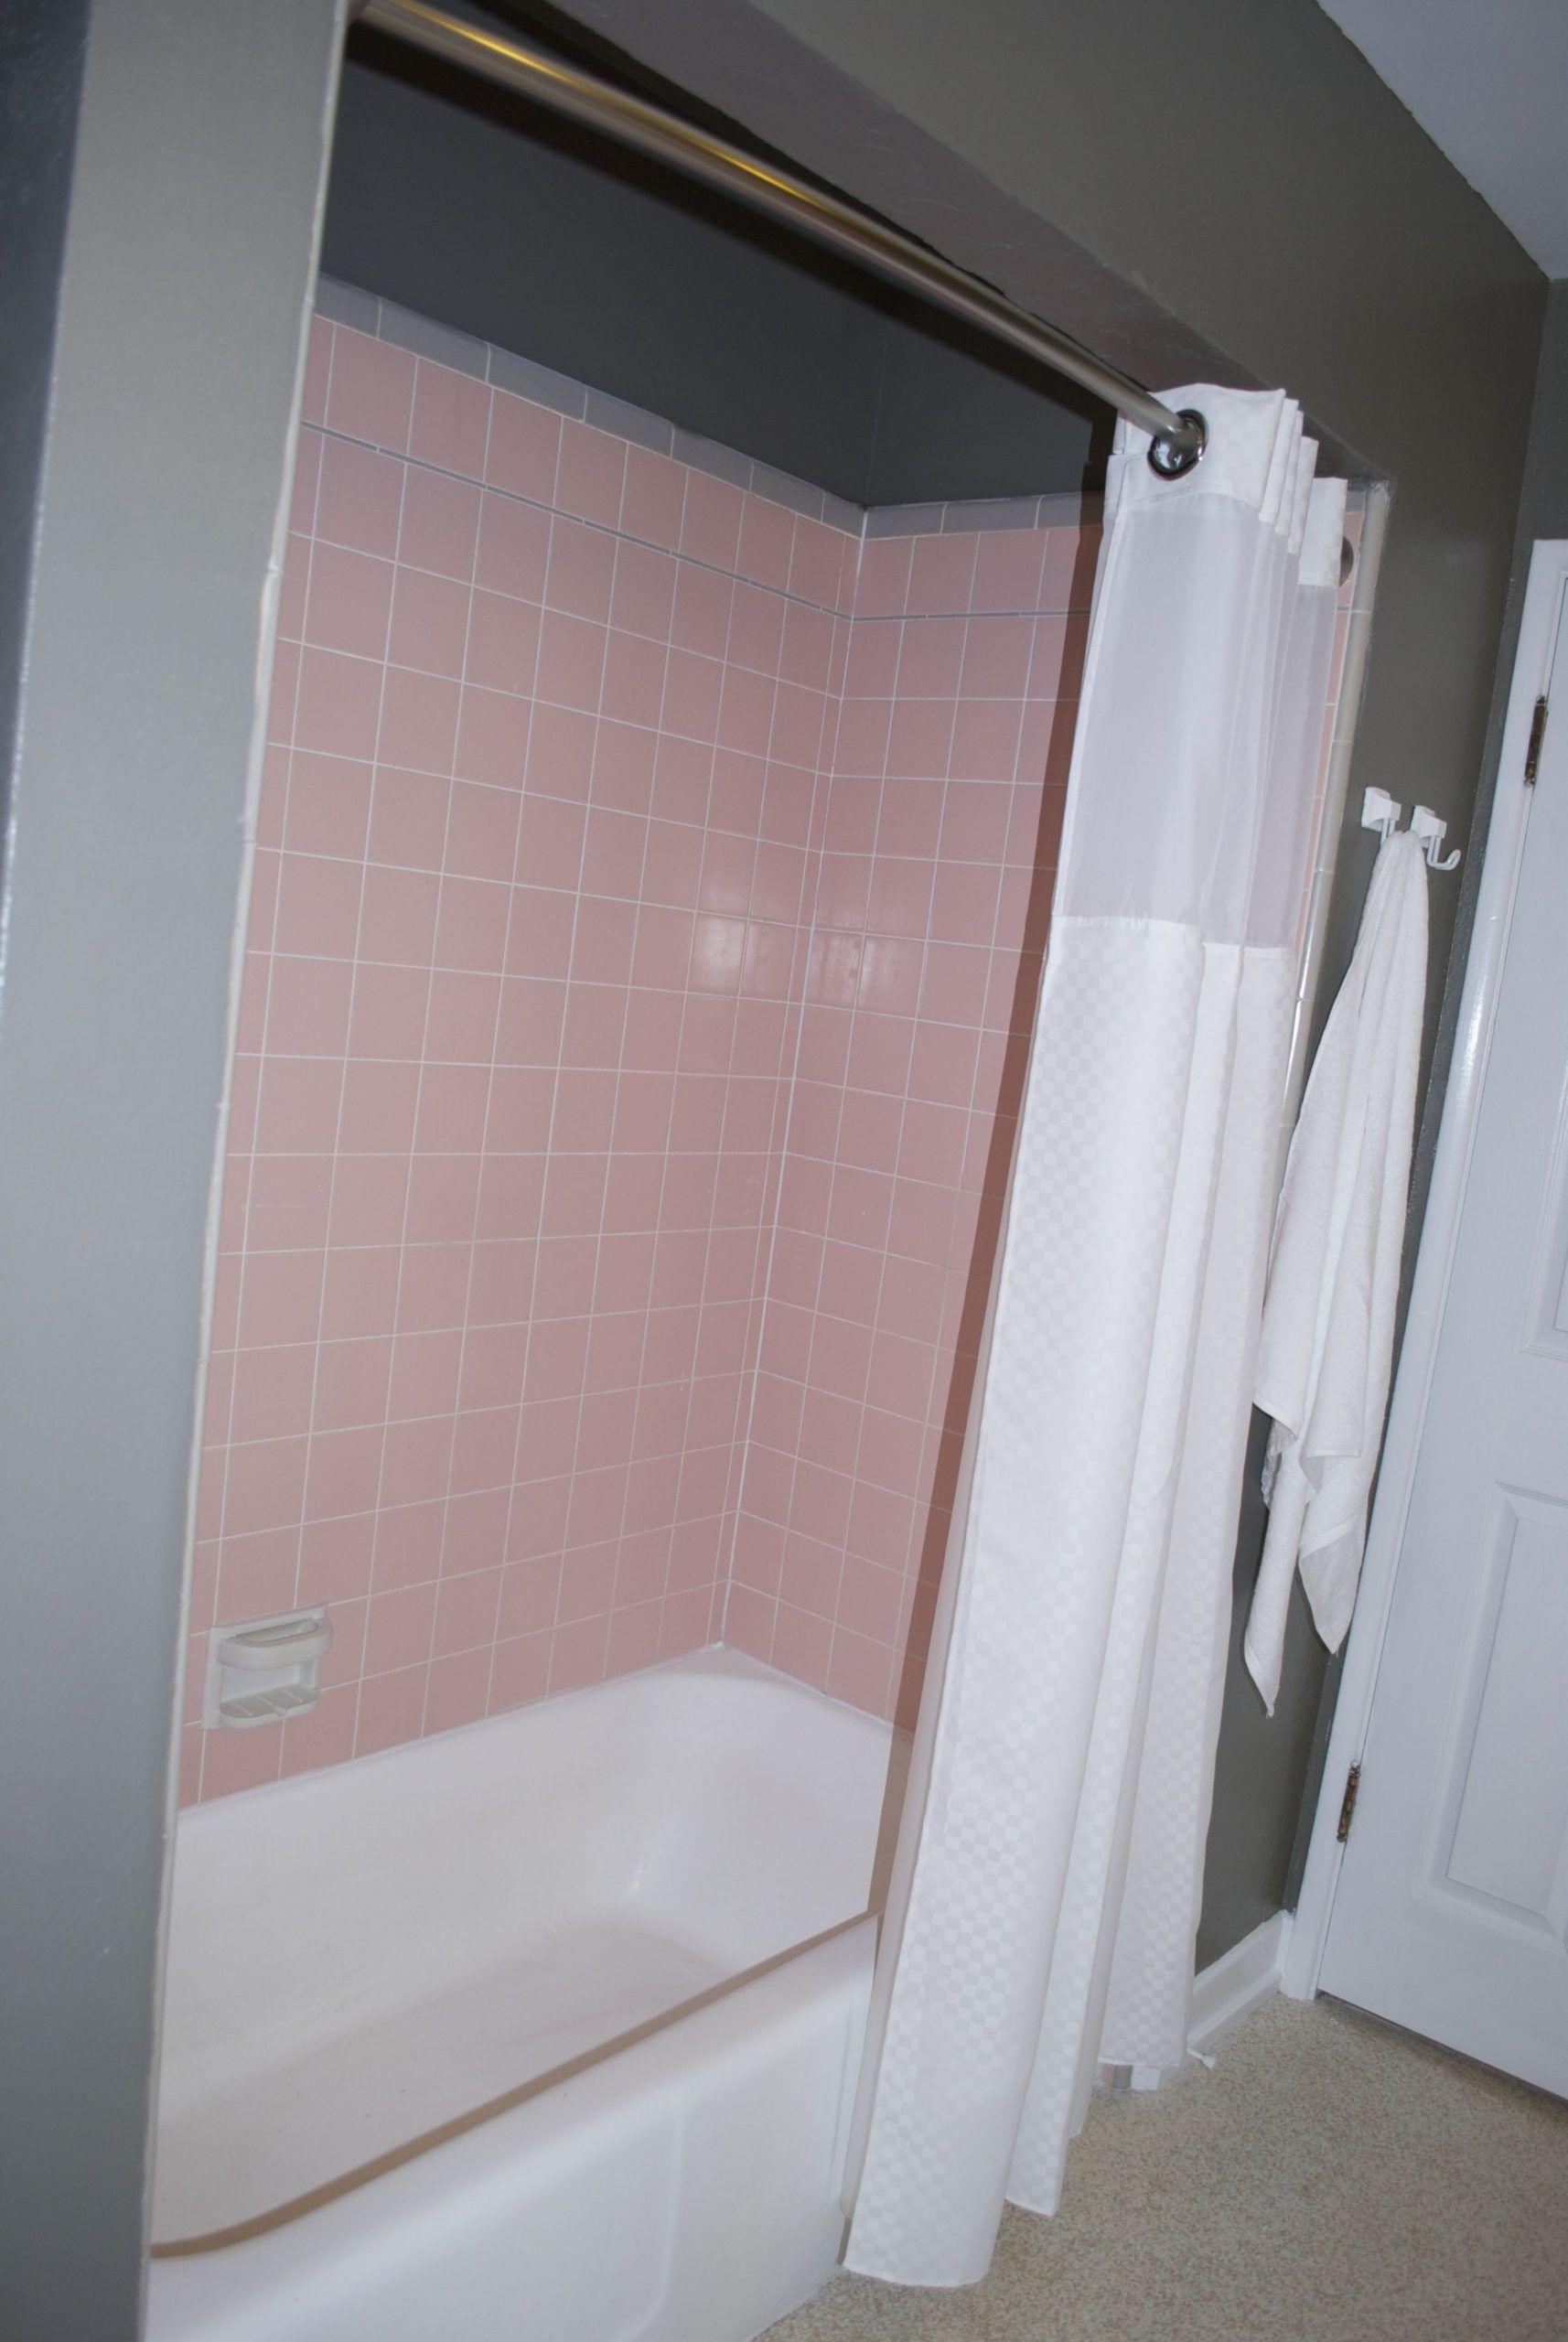 Pink Tile Bathroom Paint Color In 2020 Pink Bathroom Tiles Tile Bathroom Pink Tiles